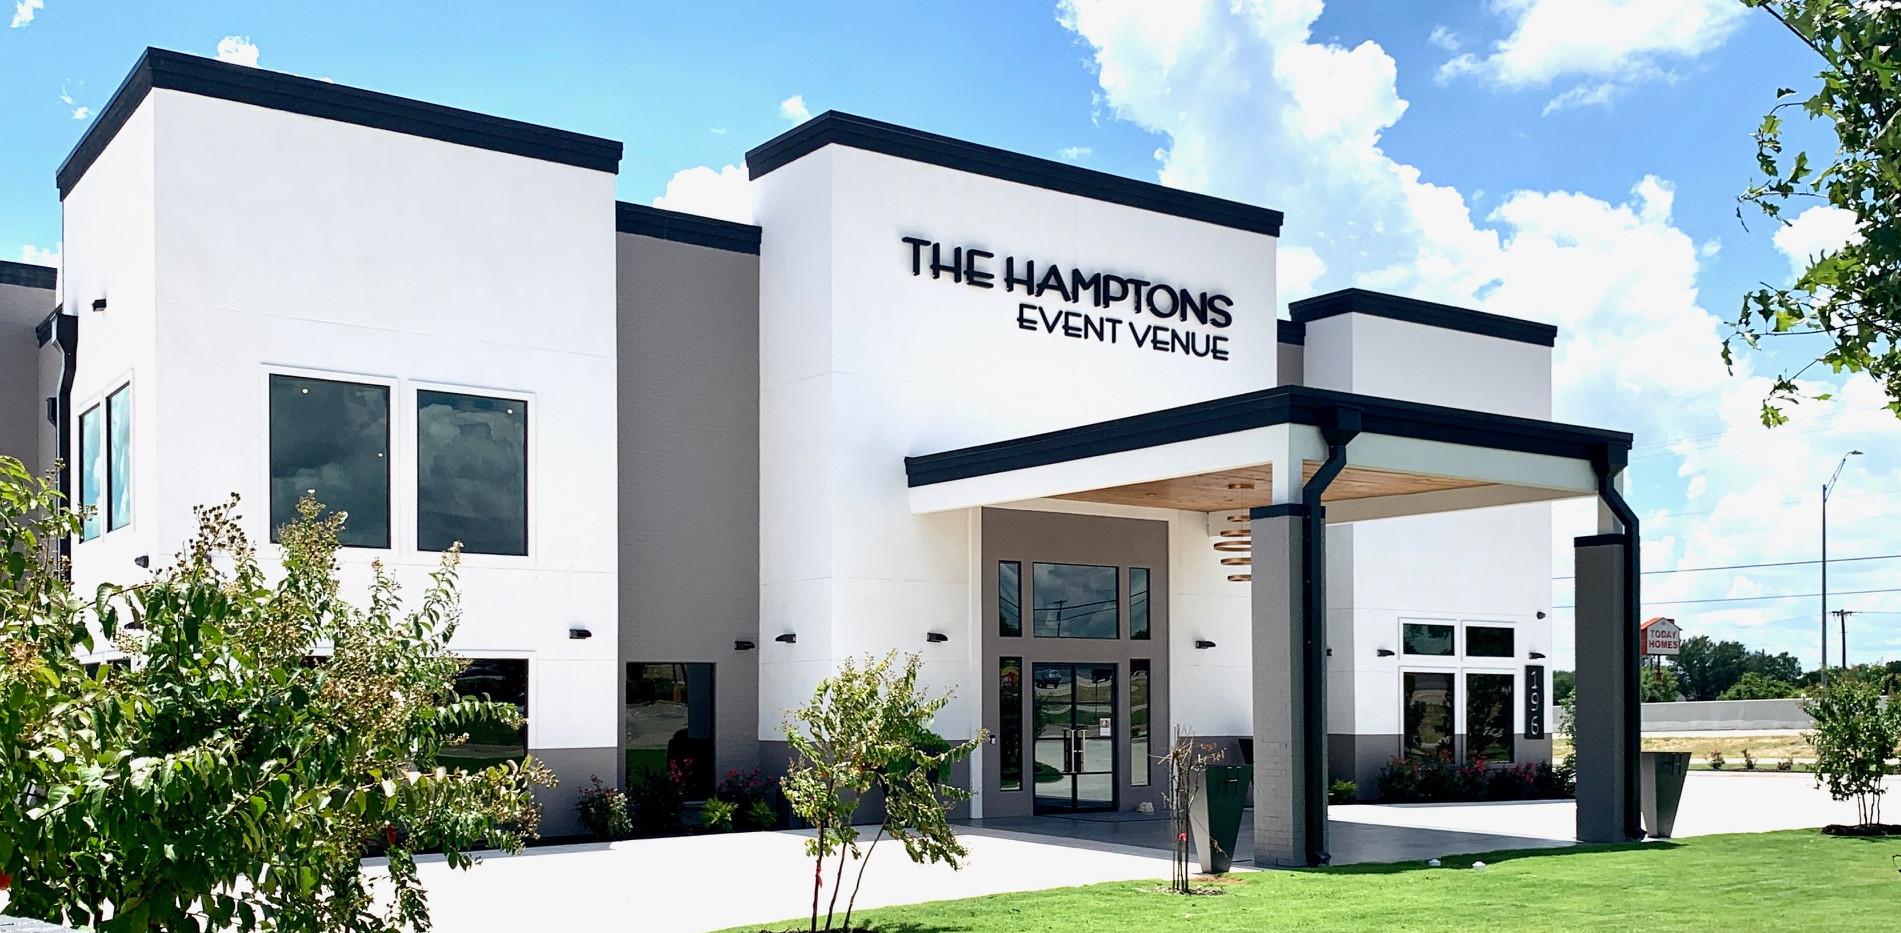 THE HAMPTONS EVENT VENUE